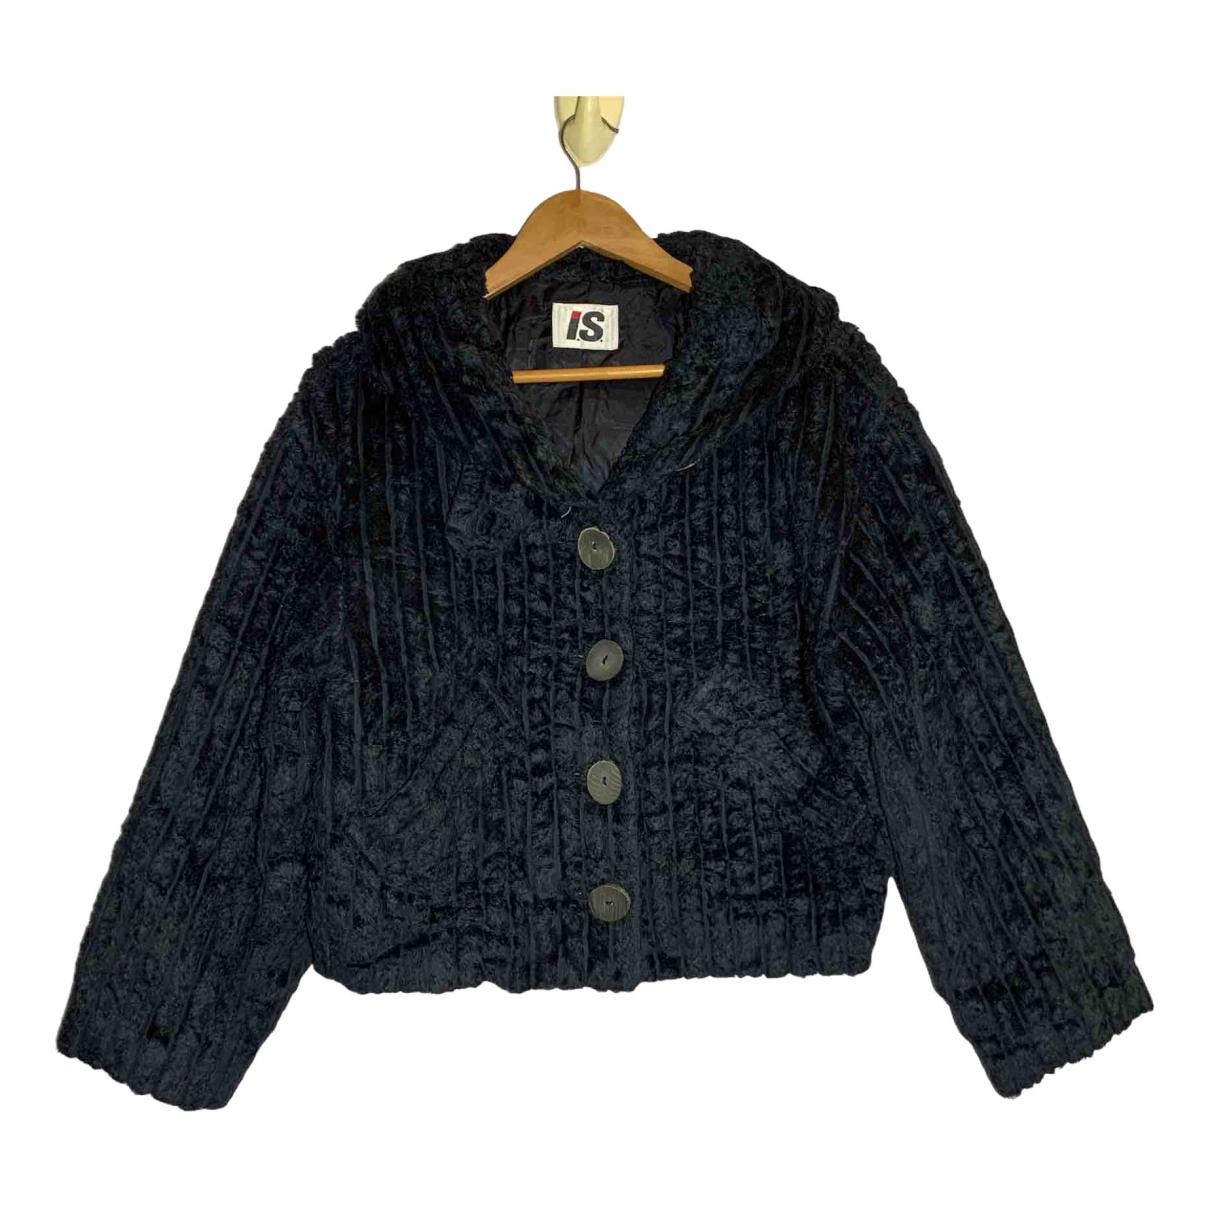 Issey Miyake \N Jacke in  Schwarz Baumwolle